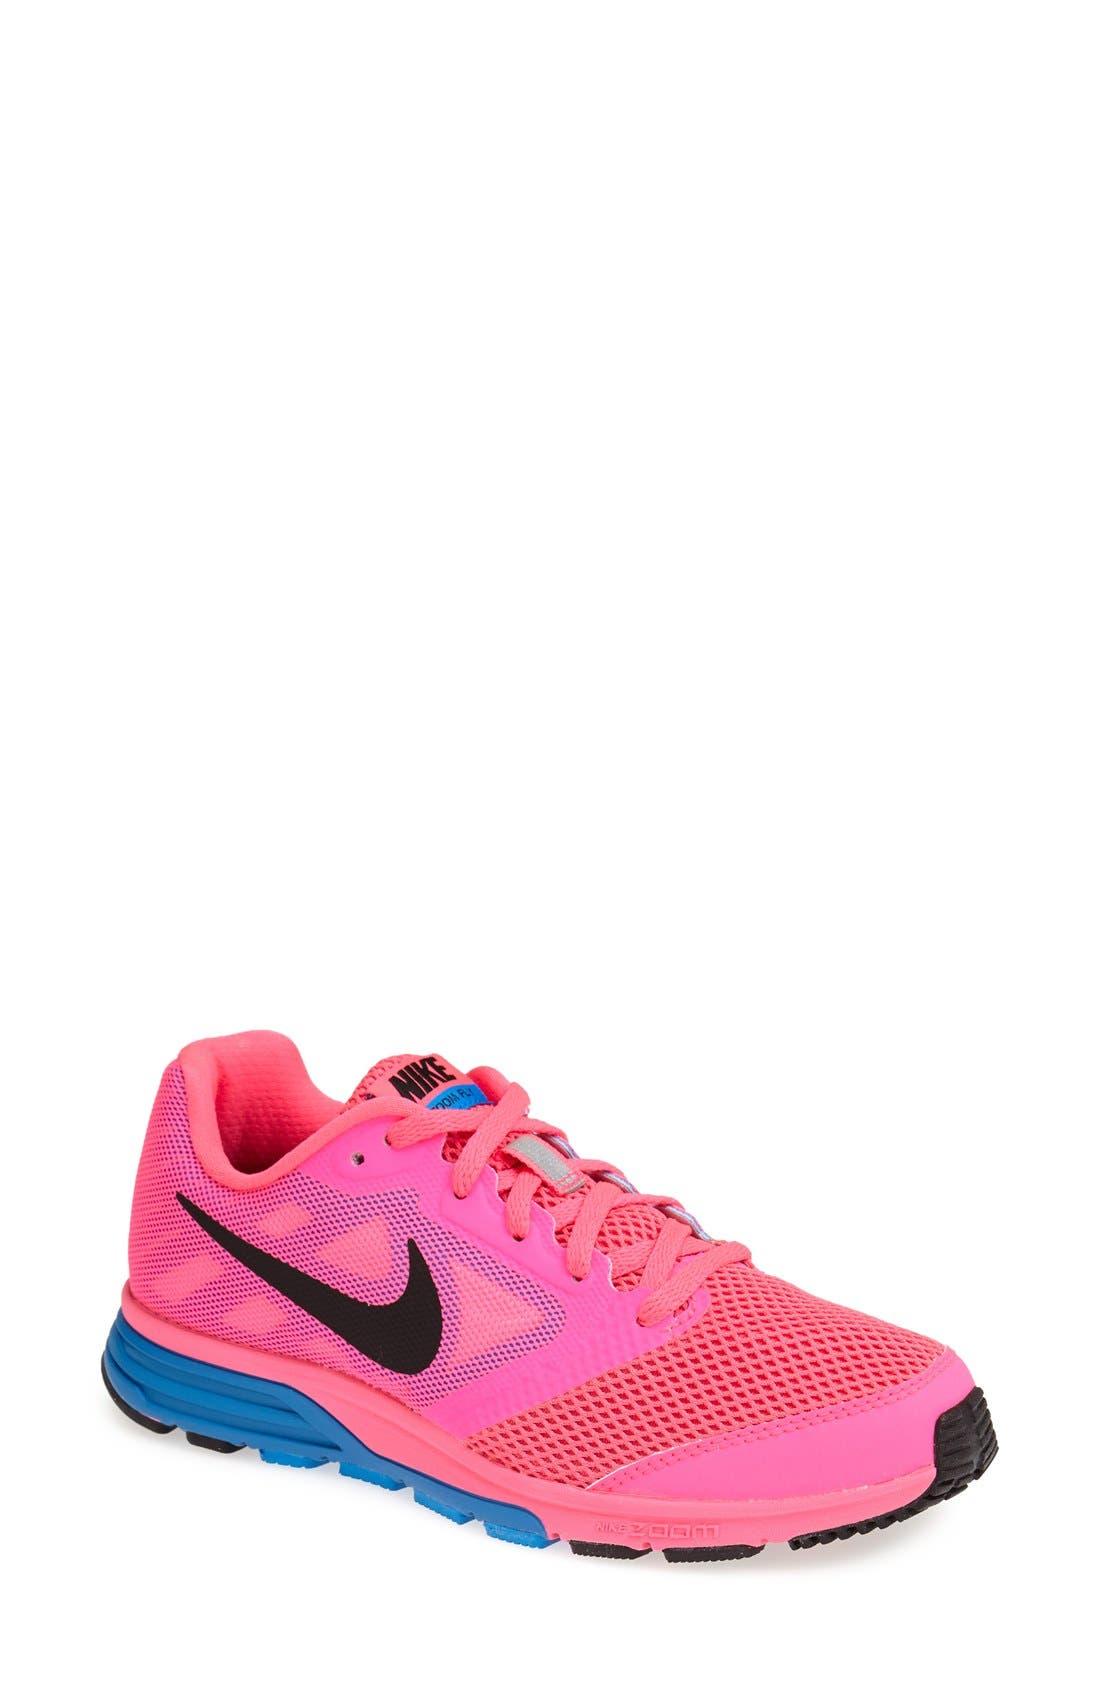 Alternate Image 1 Selected - Nike 'Zoom Fly' Running Shoe (Women)